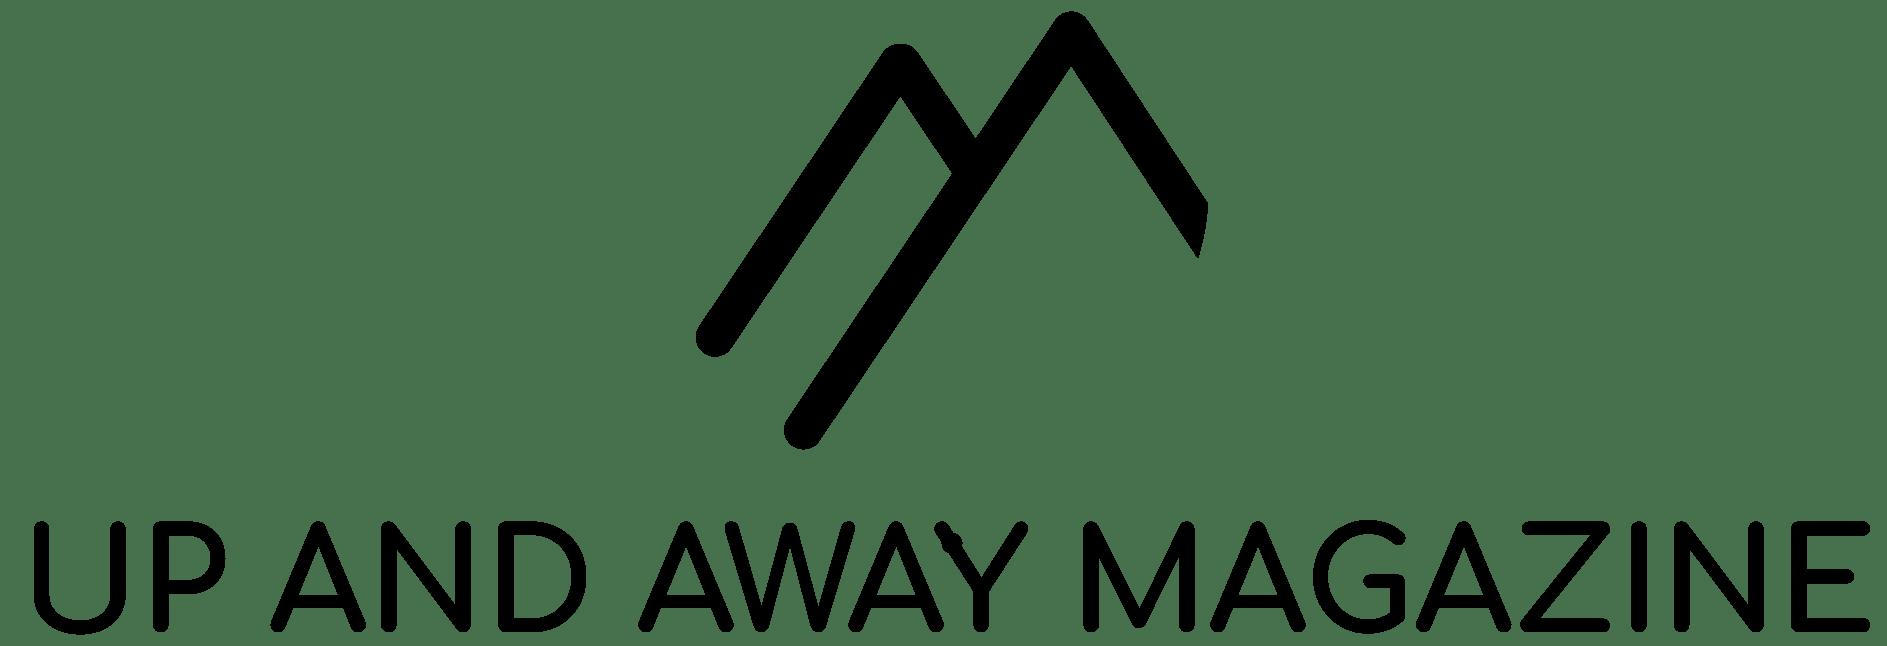 Up and Away Adventure Travel Magazine